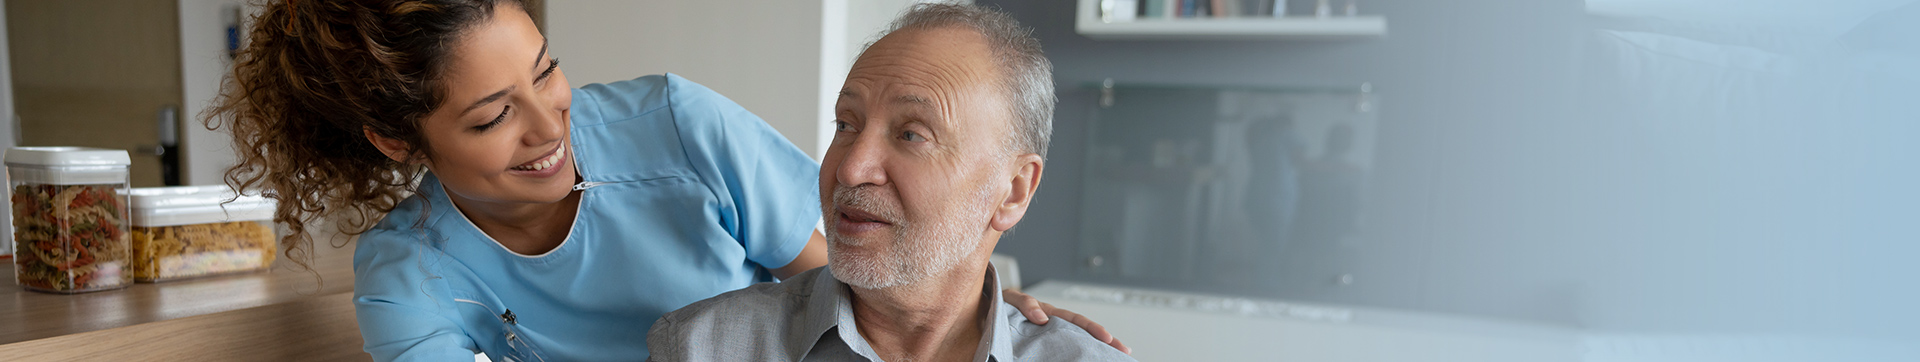 Alzheimer's & dementia care services in Gilbert & Chandler